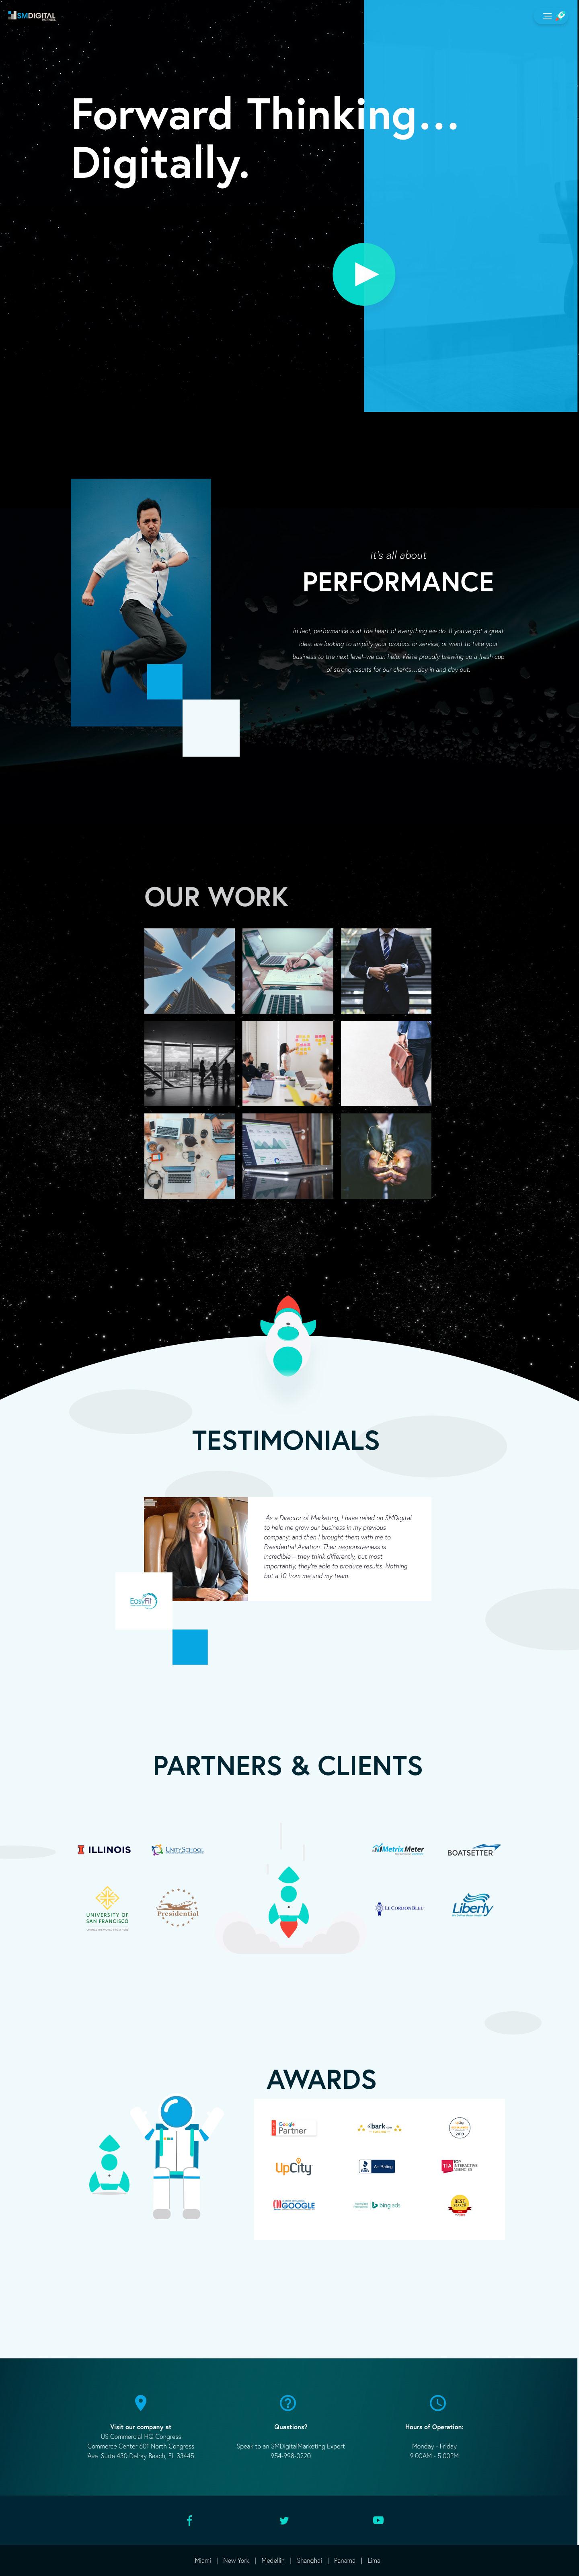 Digital Marketing Company Homepage Concept